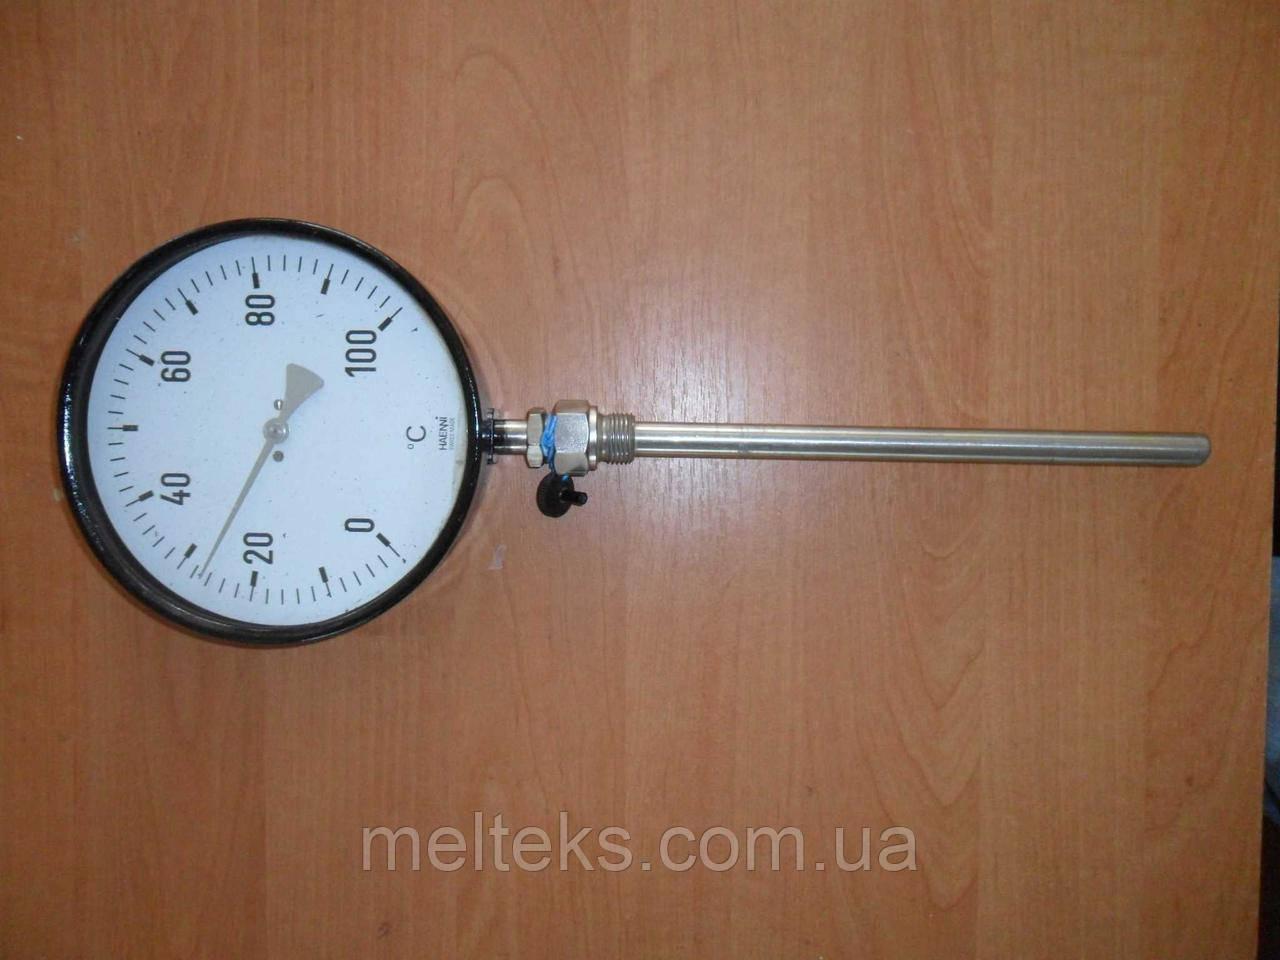 Термометр пищевой 0-100 Швейцария